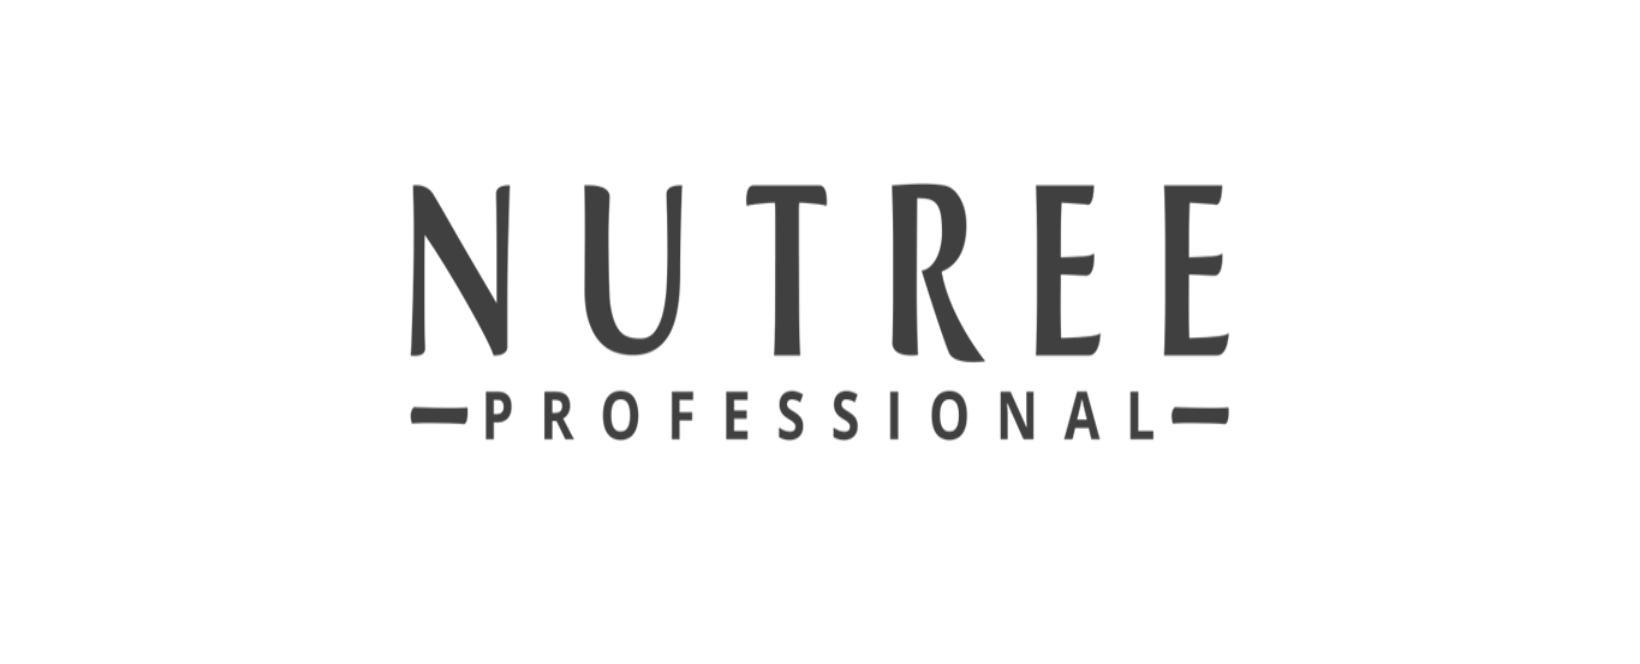 nutreecosmetics Discount Code 2021